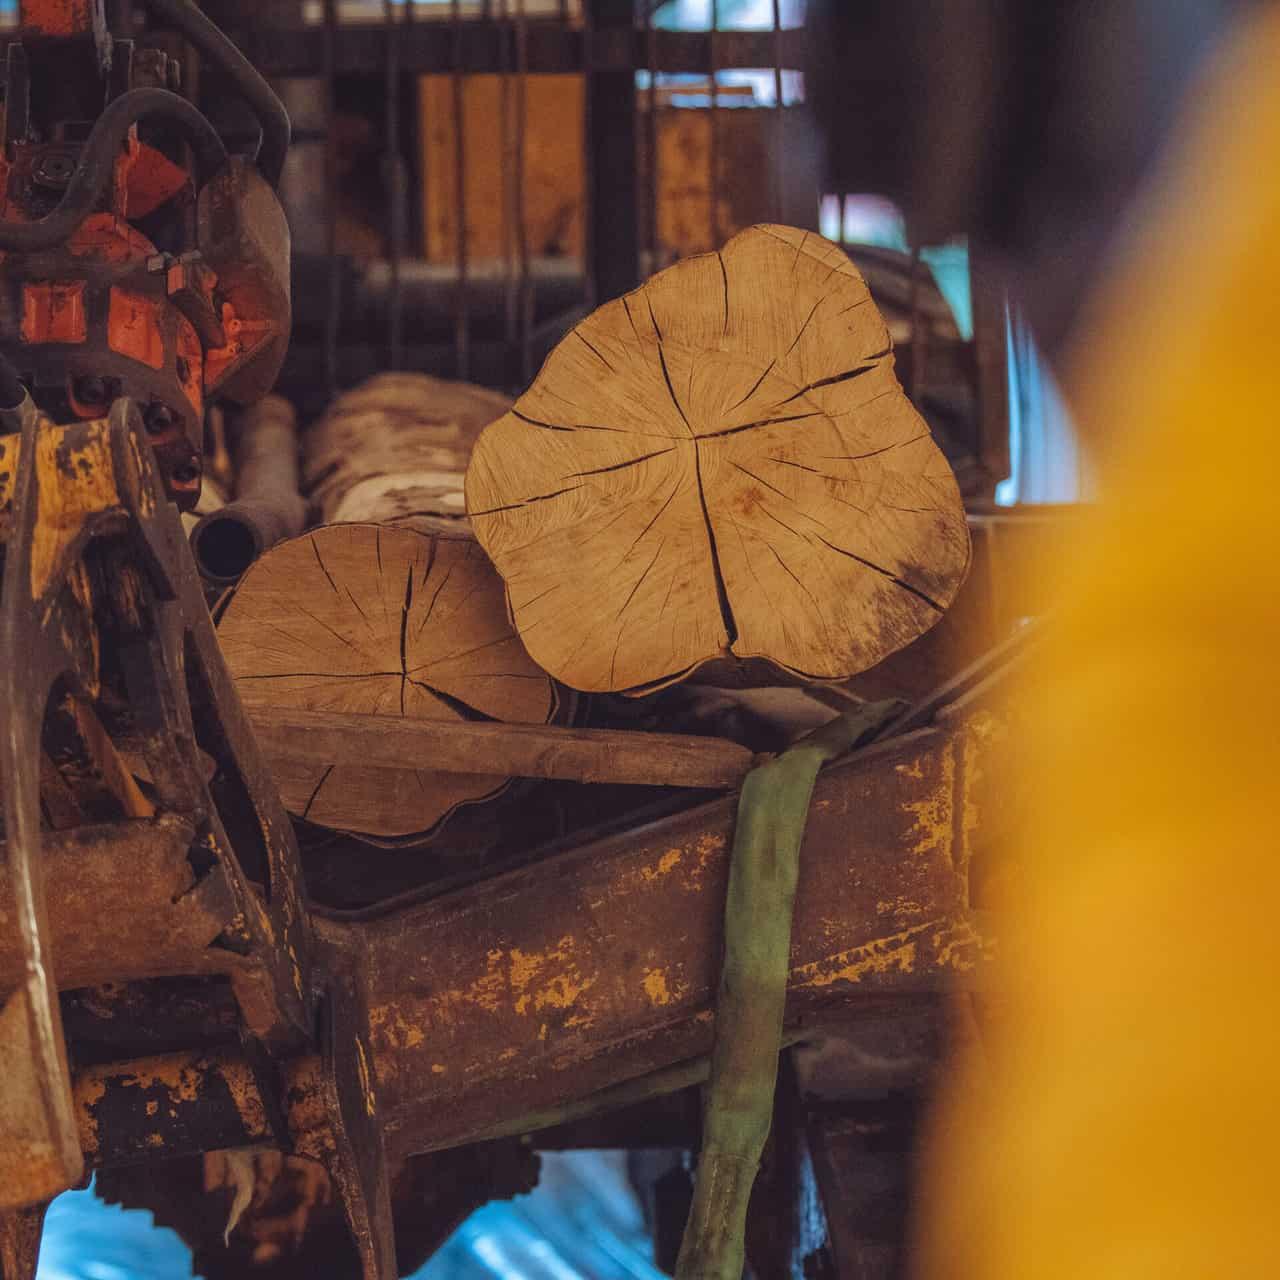 oplev de store skovmaskiner i udstillingen STORT